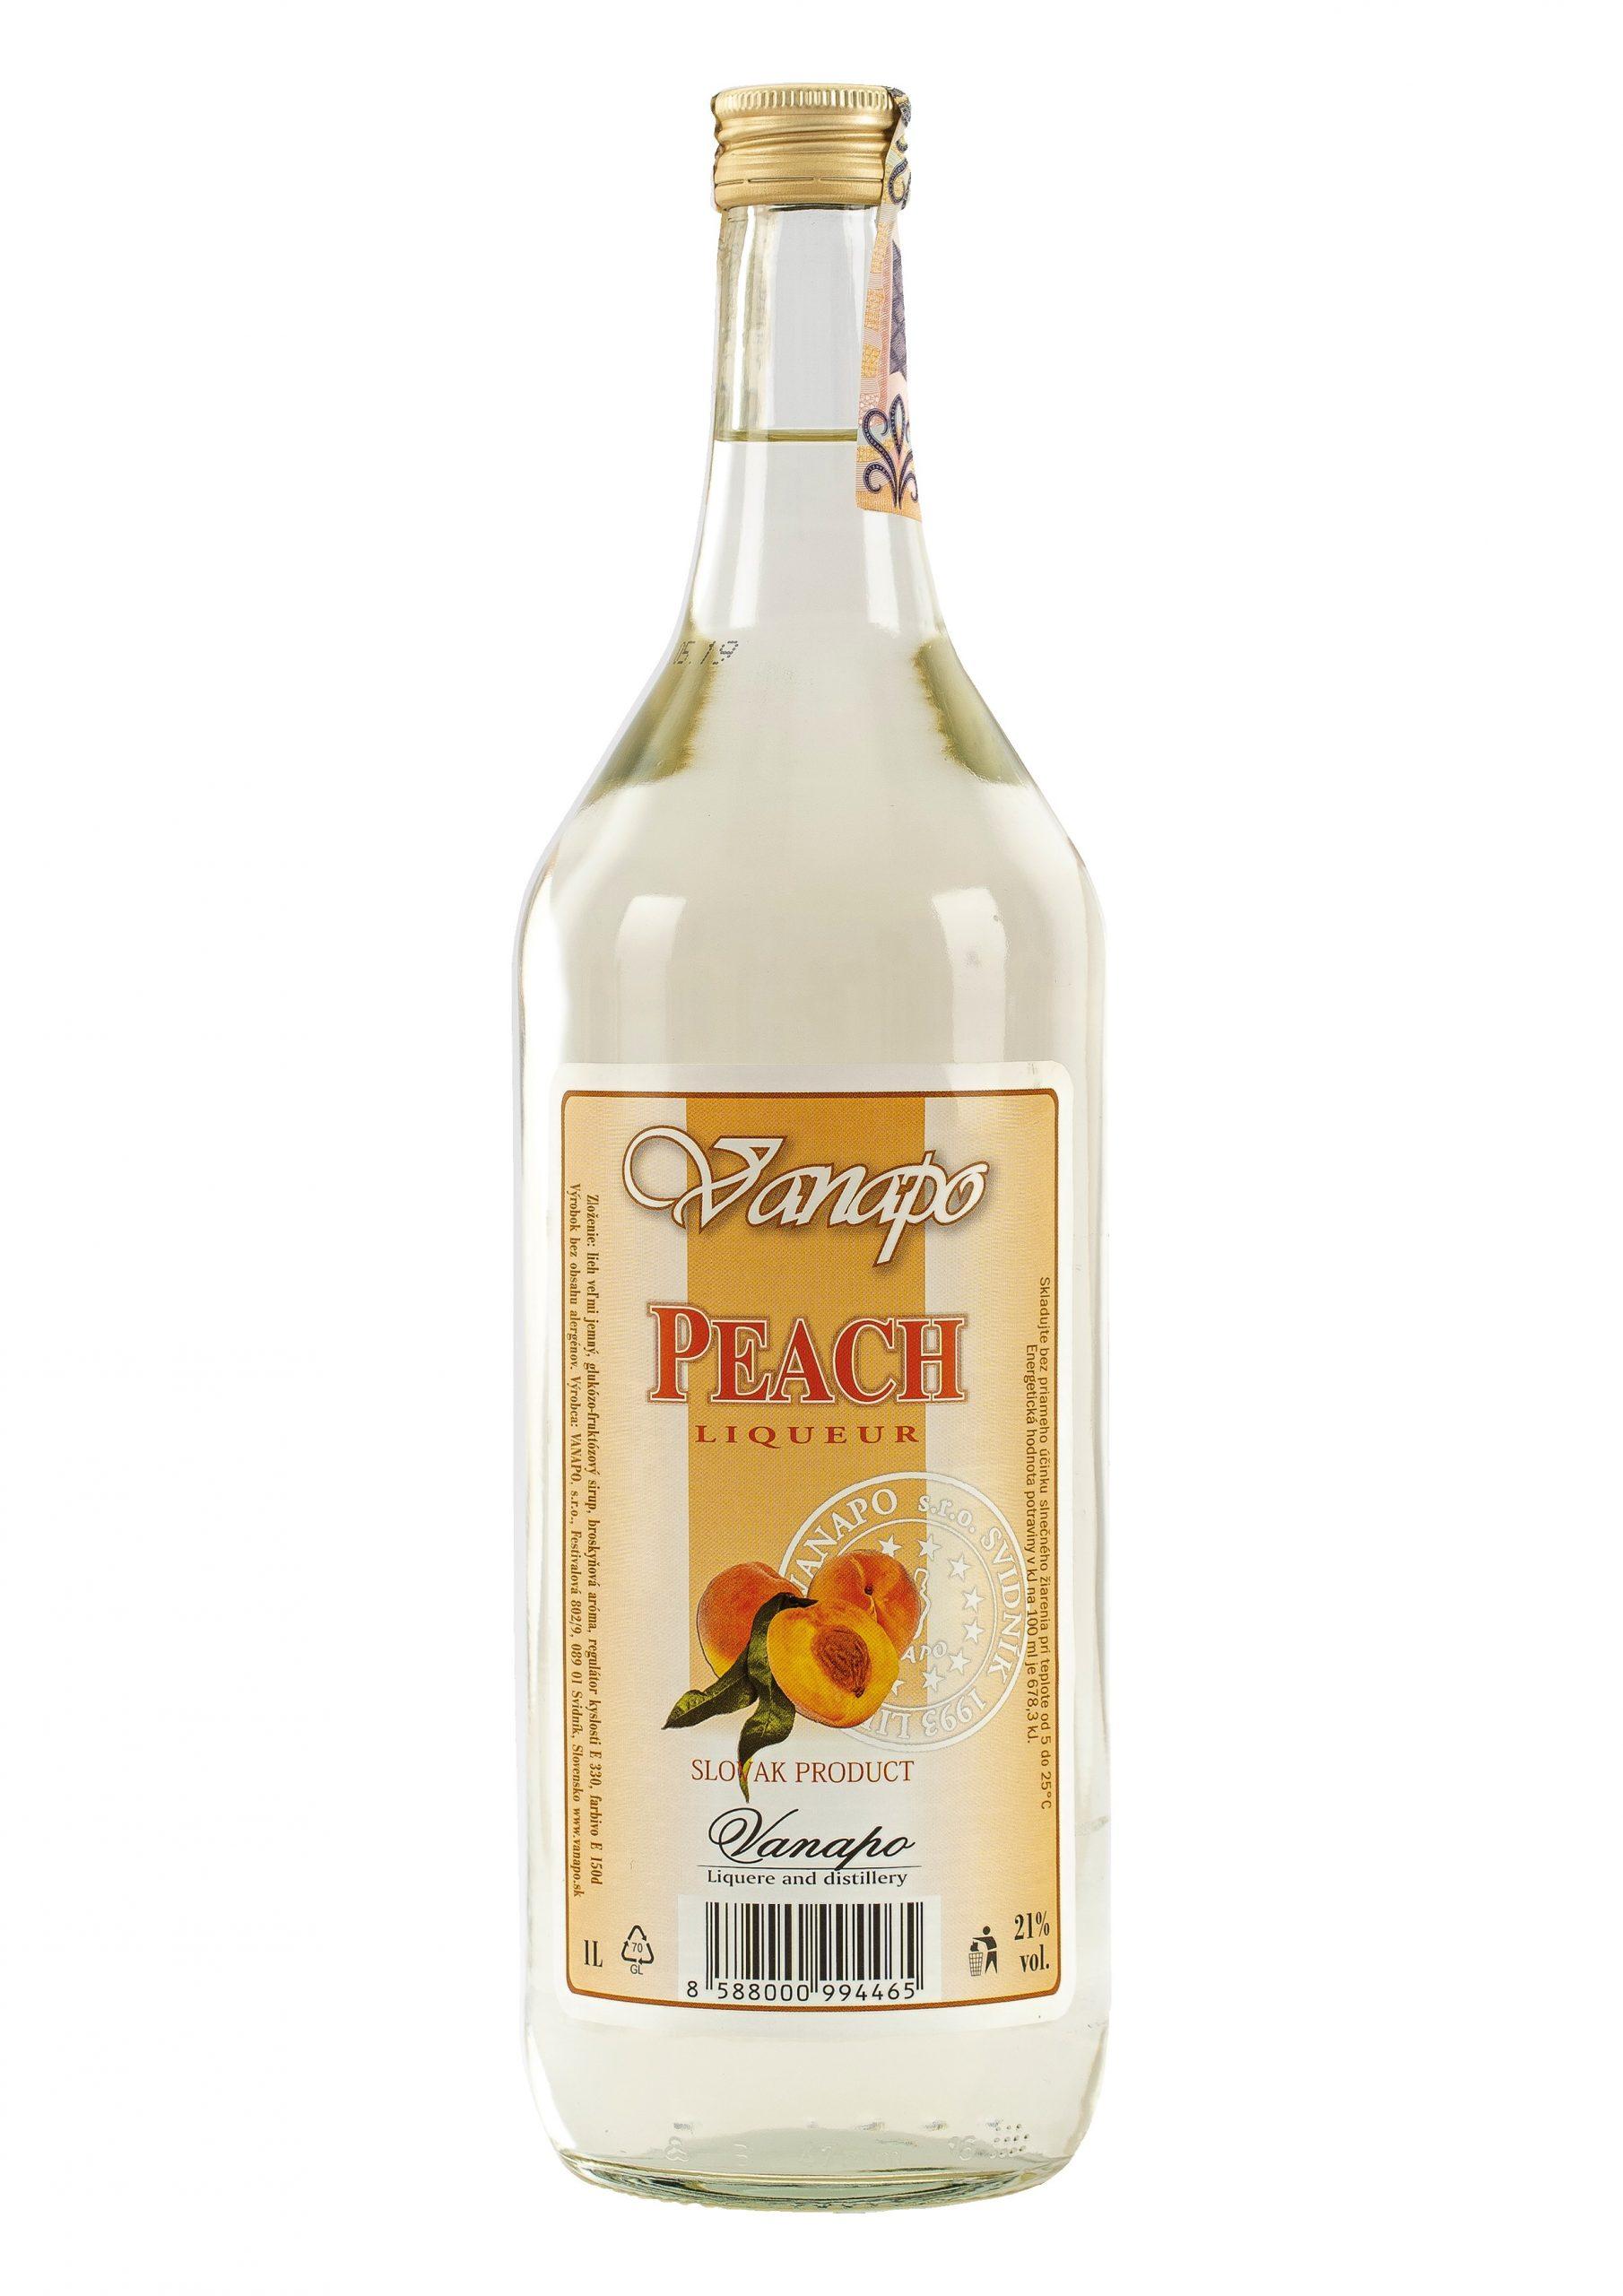 Peach liker 21 1L scaled 1 - Peach likér